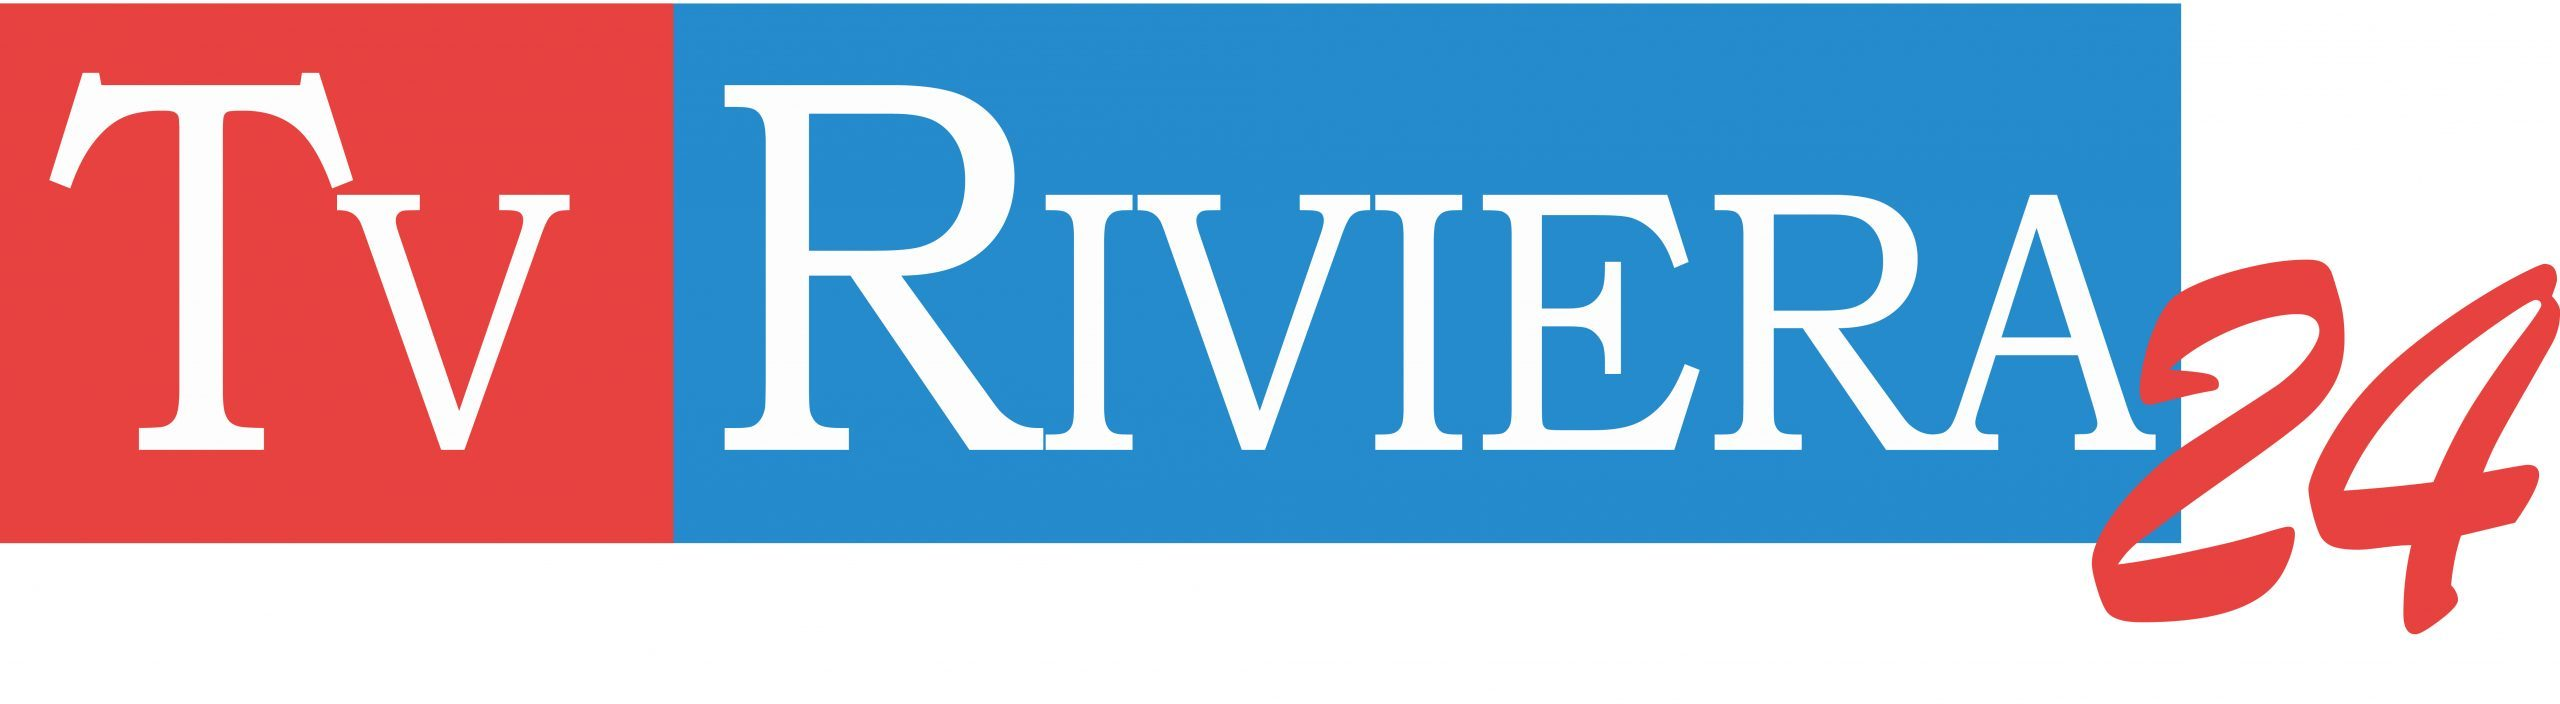 TV Riviera 24